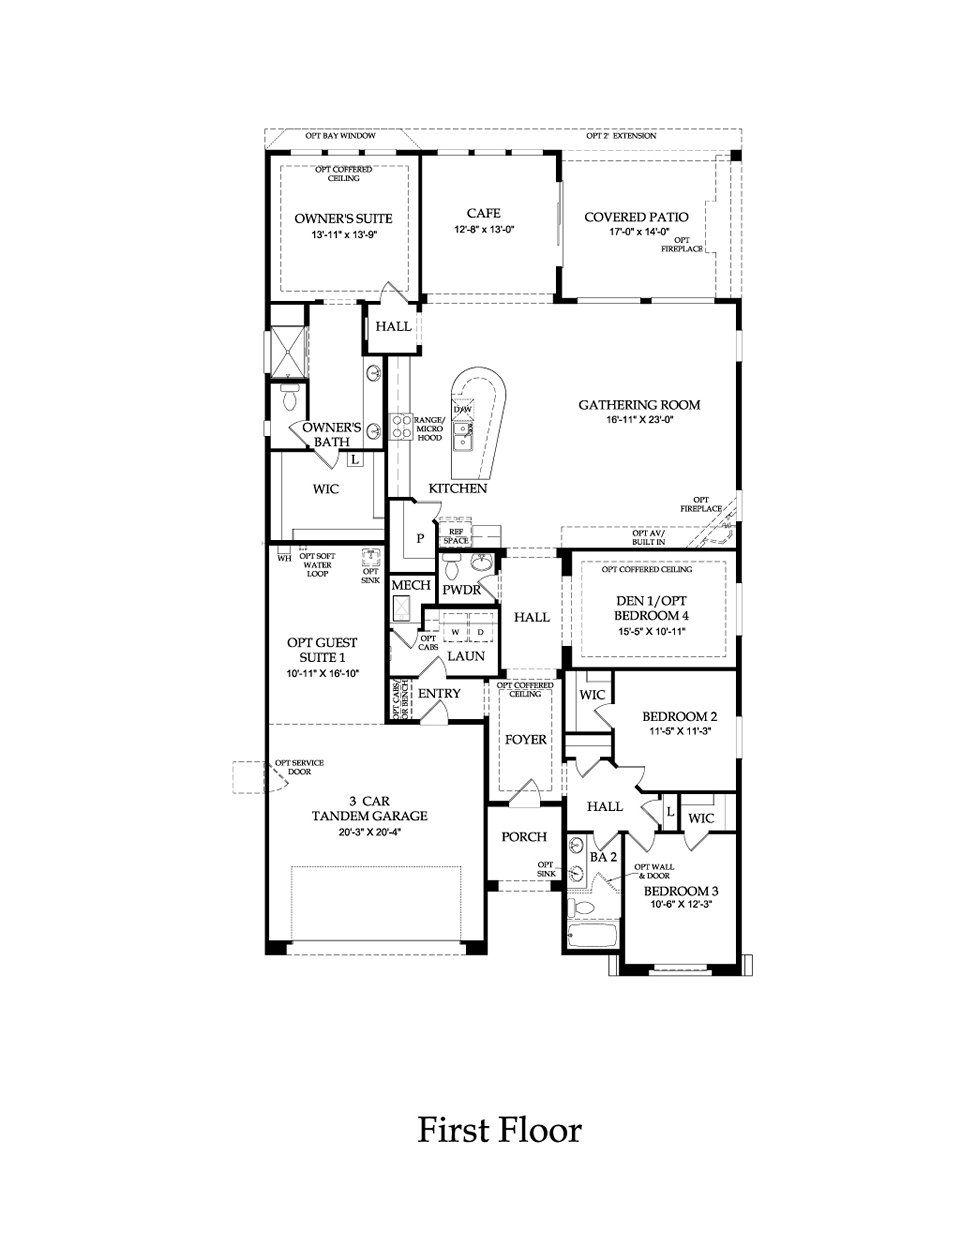 pulte home  parklane model  2449 sq  ft  lots of options